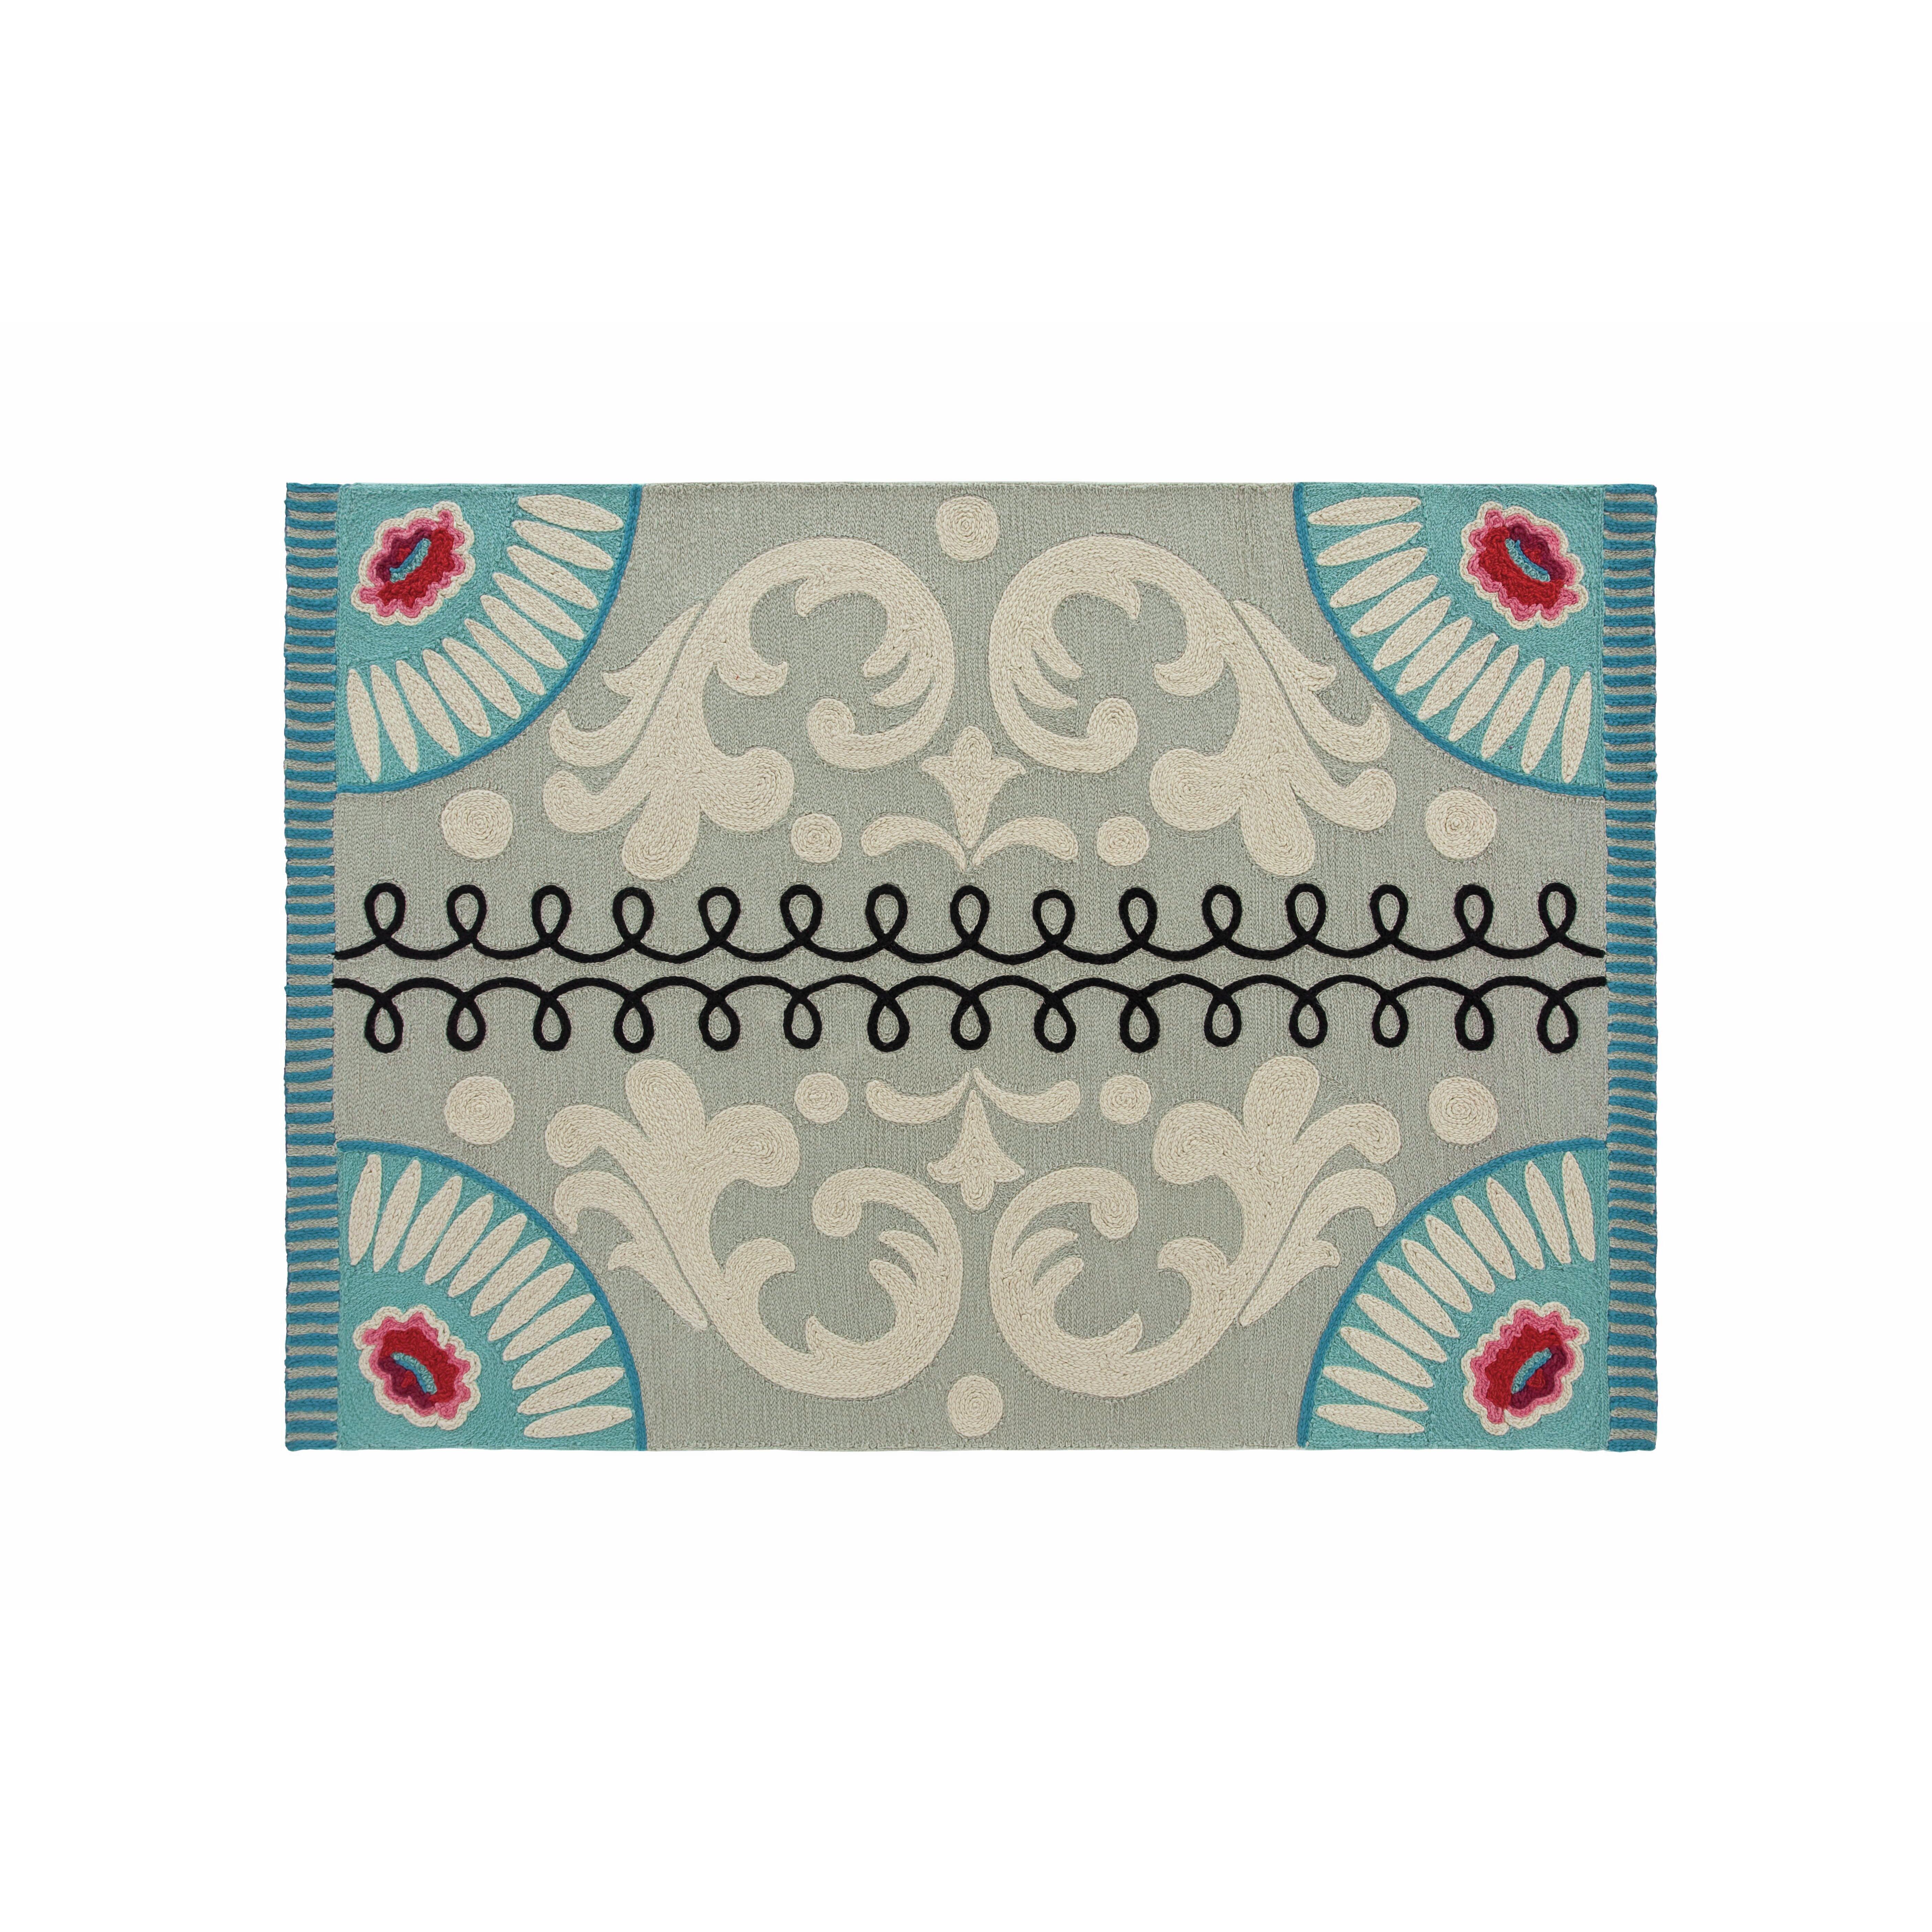 gan rugs cedeneta goyescas blue area rug wayfair. Black Bedroom Furniture Sets. Home Design Ideas